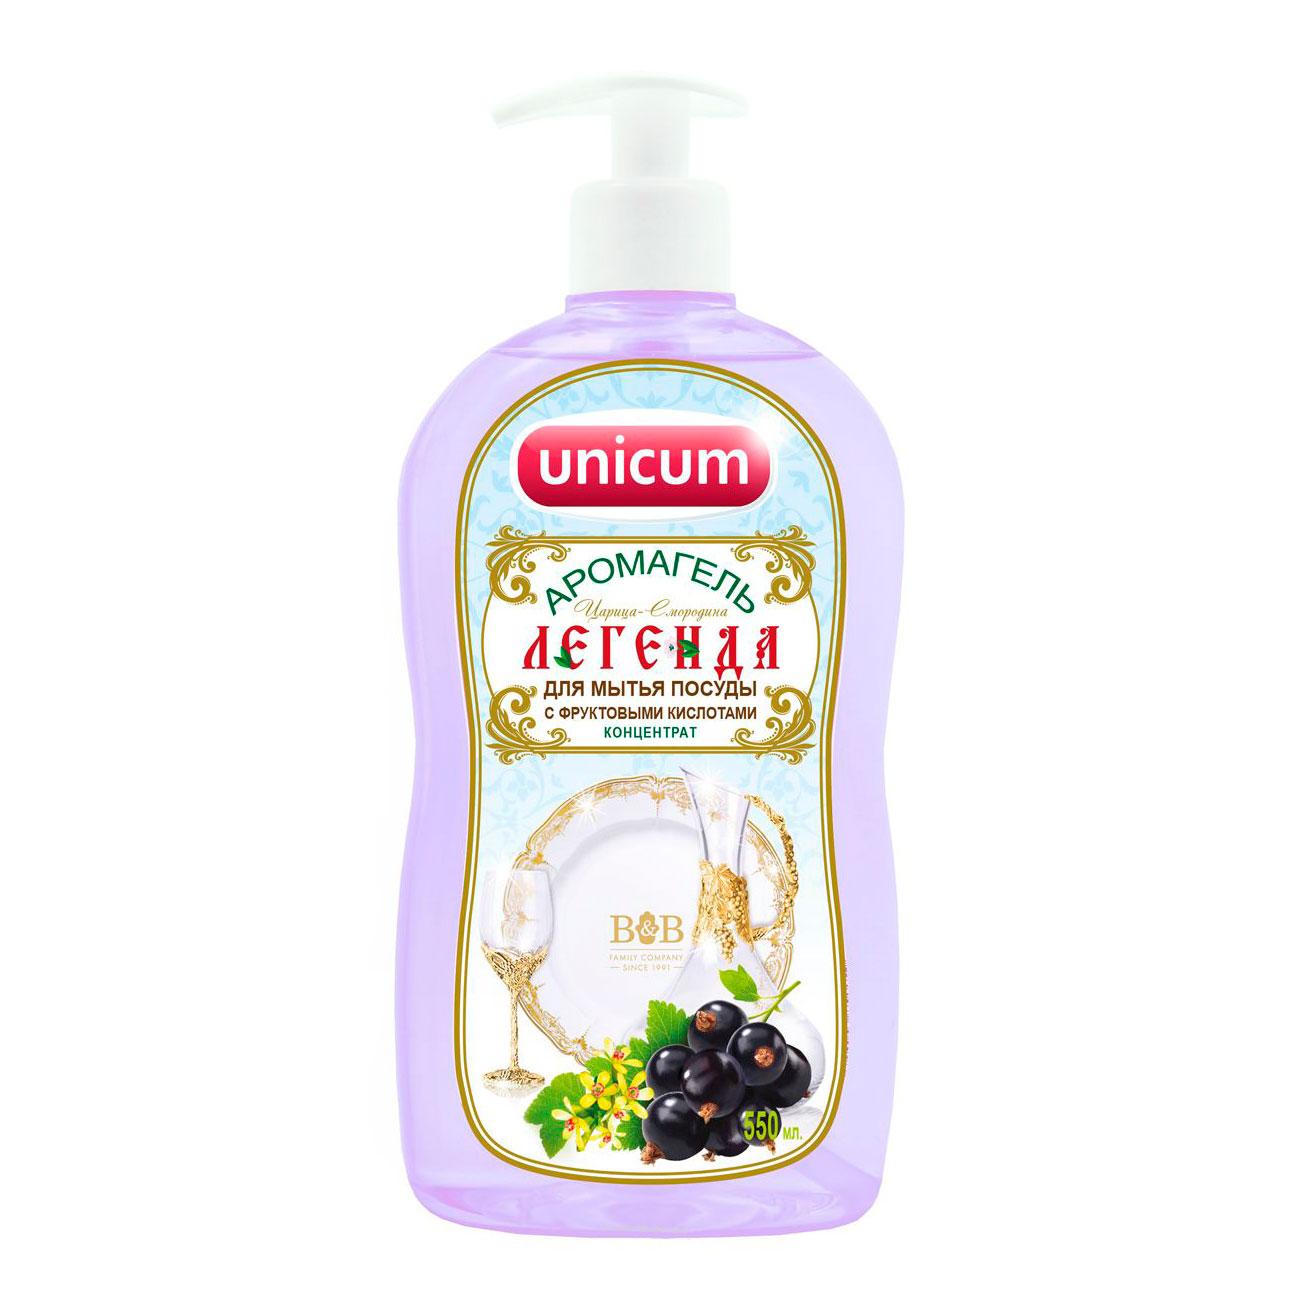 Средство для мытья посуды Unicum легенда 550 мл<br>